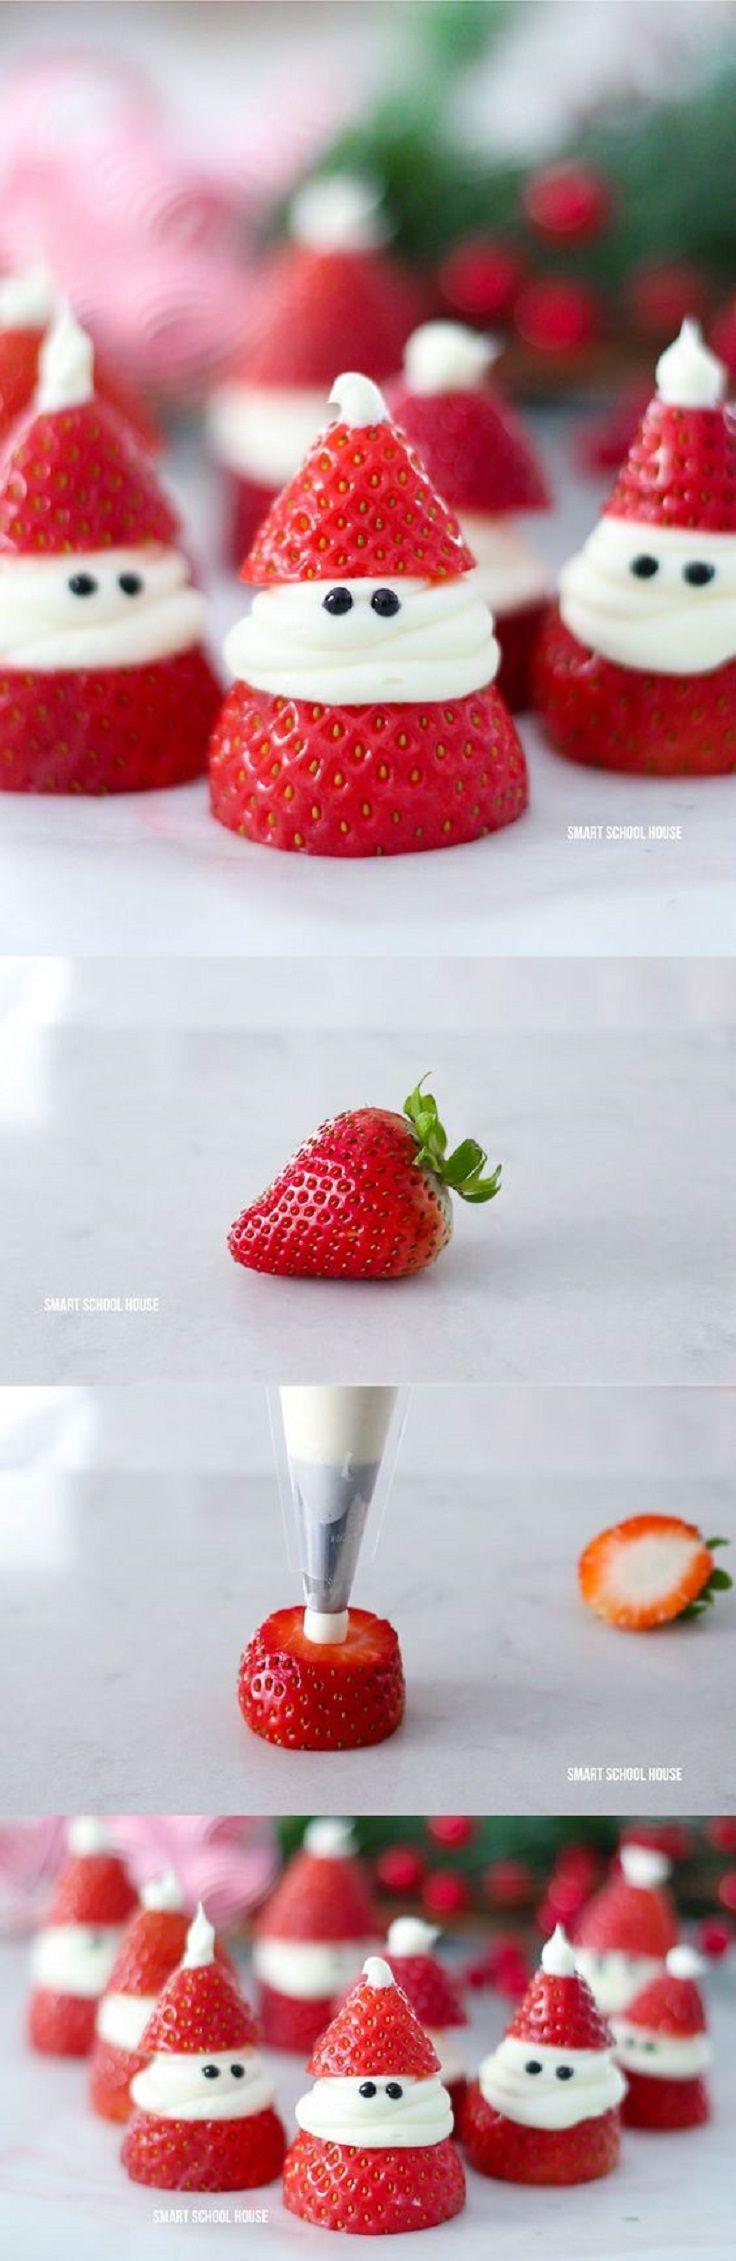 3ingredient Strawberry Santas for Christmas 19